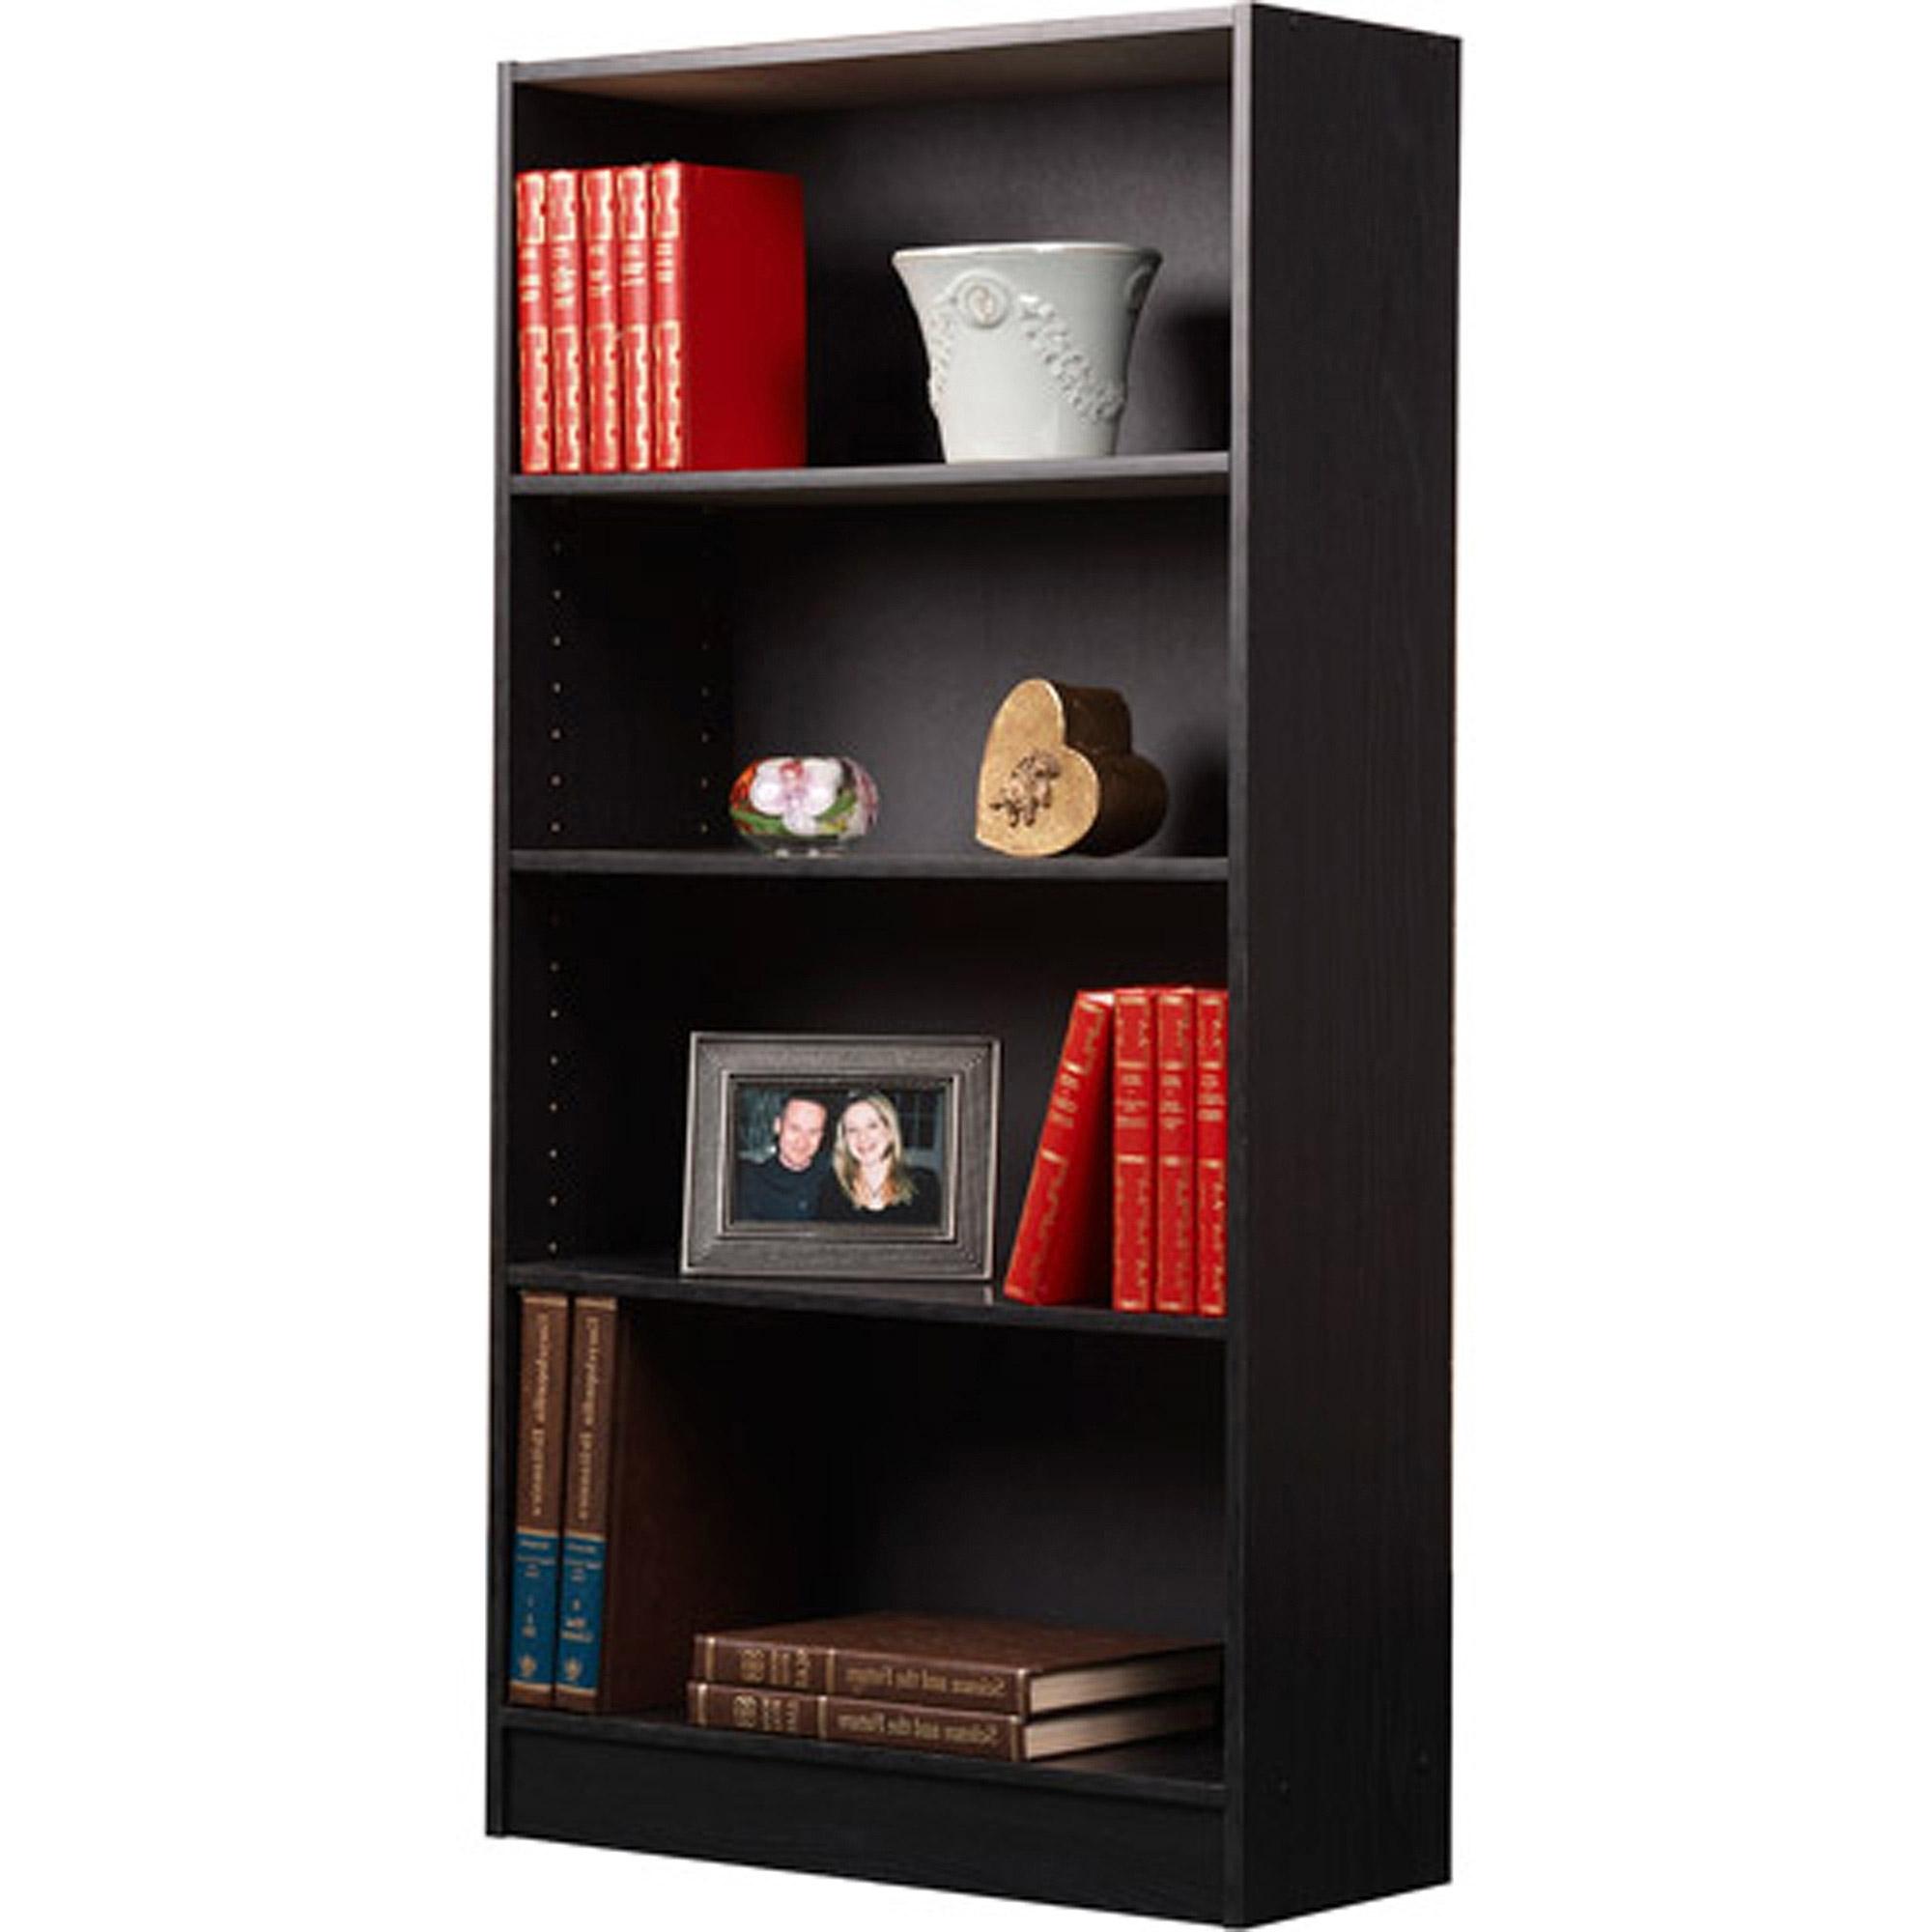 Walmart 3 Shelf Bookcases Inside Well Known Orion 4 Shelf Bookcases, Set Of 2 – Walmart (View 13 of 15)